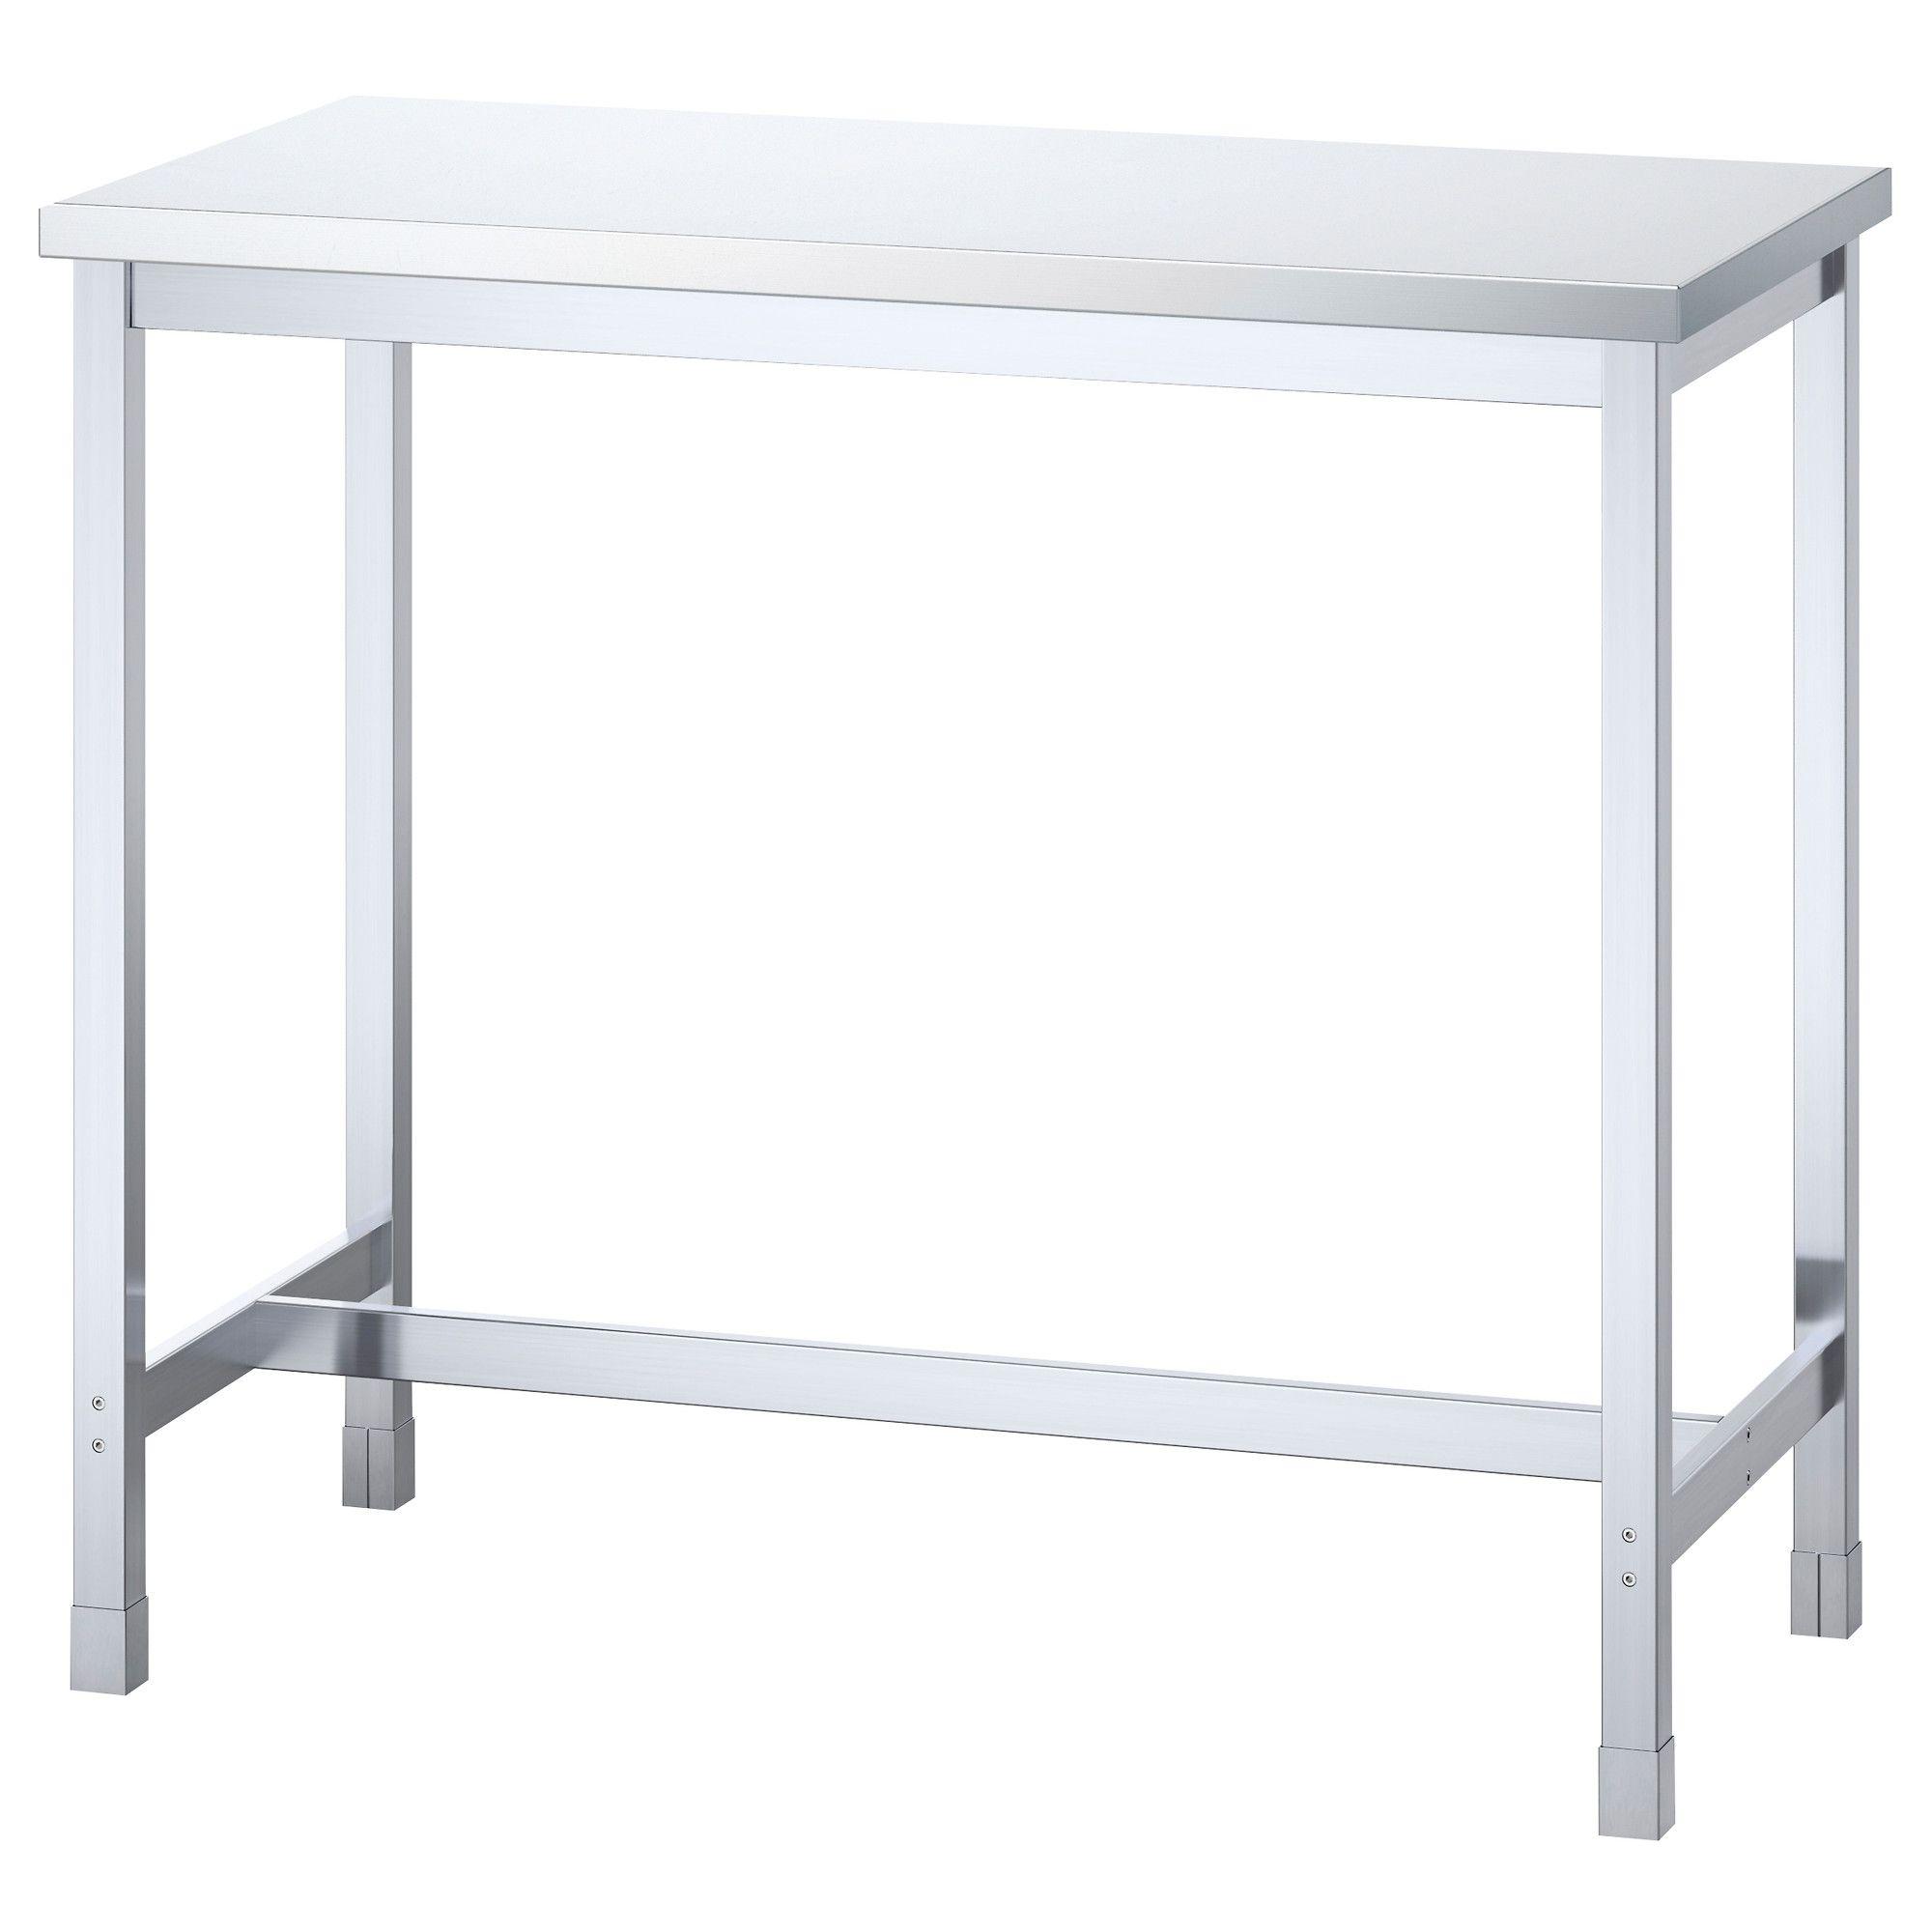 Us Furniture And Home Furnishings My Humble Abode Bar